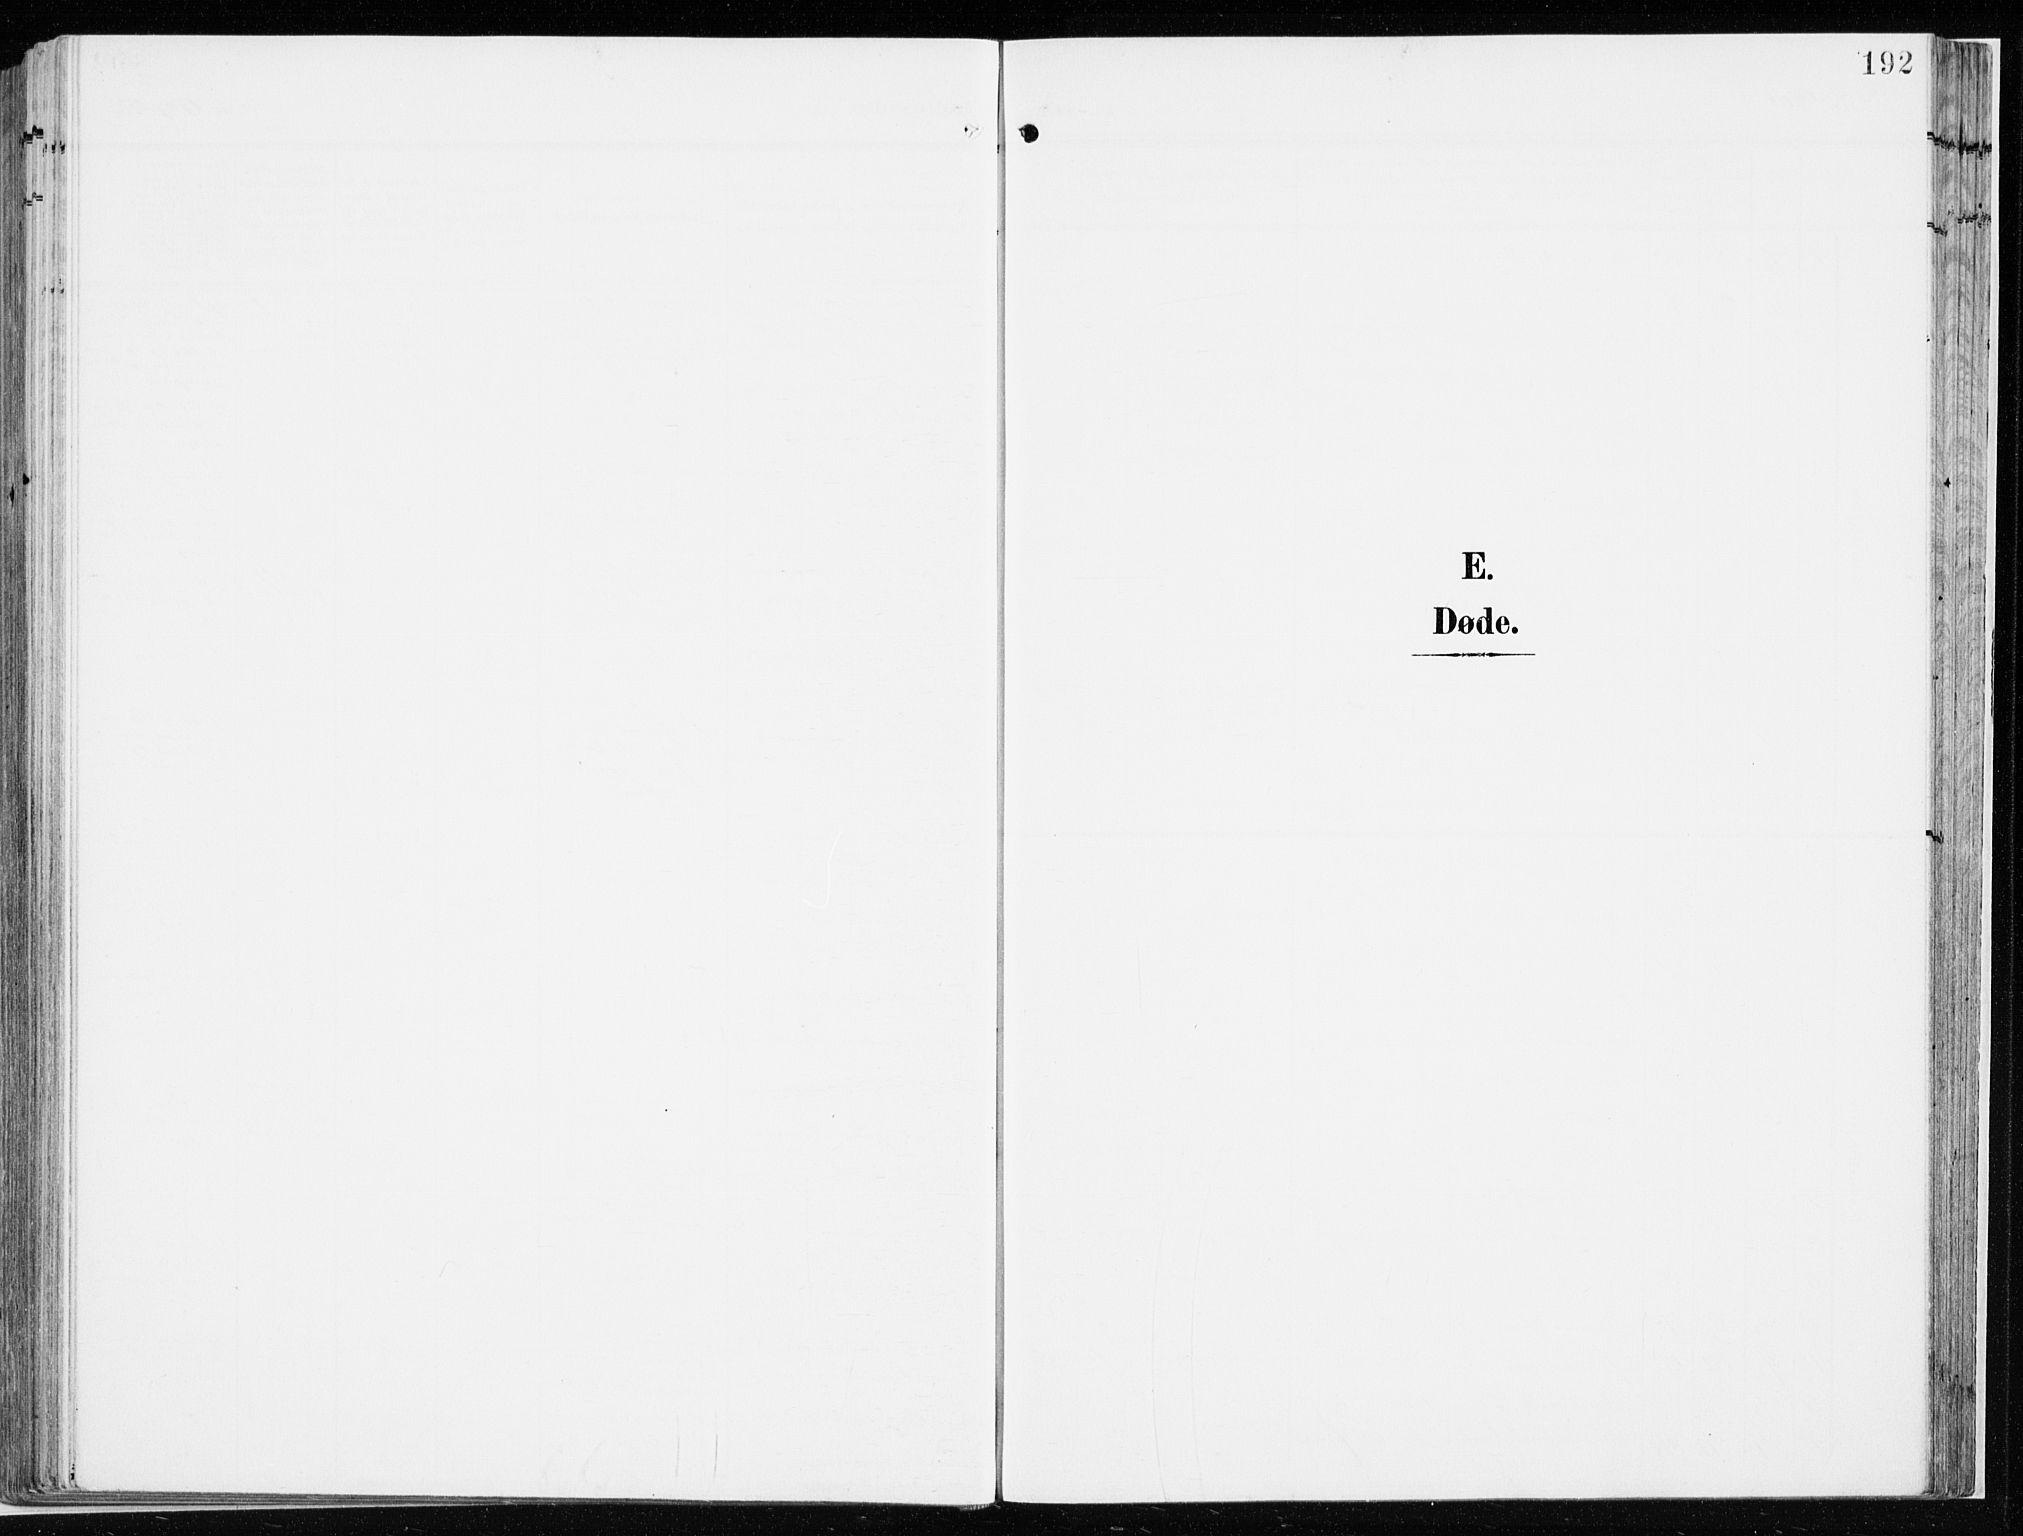 SAH, Løten prestekontor, K/Ka/L0011: Ministerialbok nr. 11, 1908-1917, s. 192